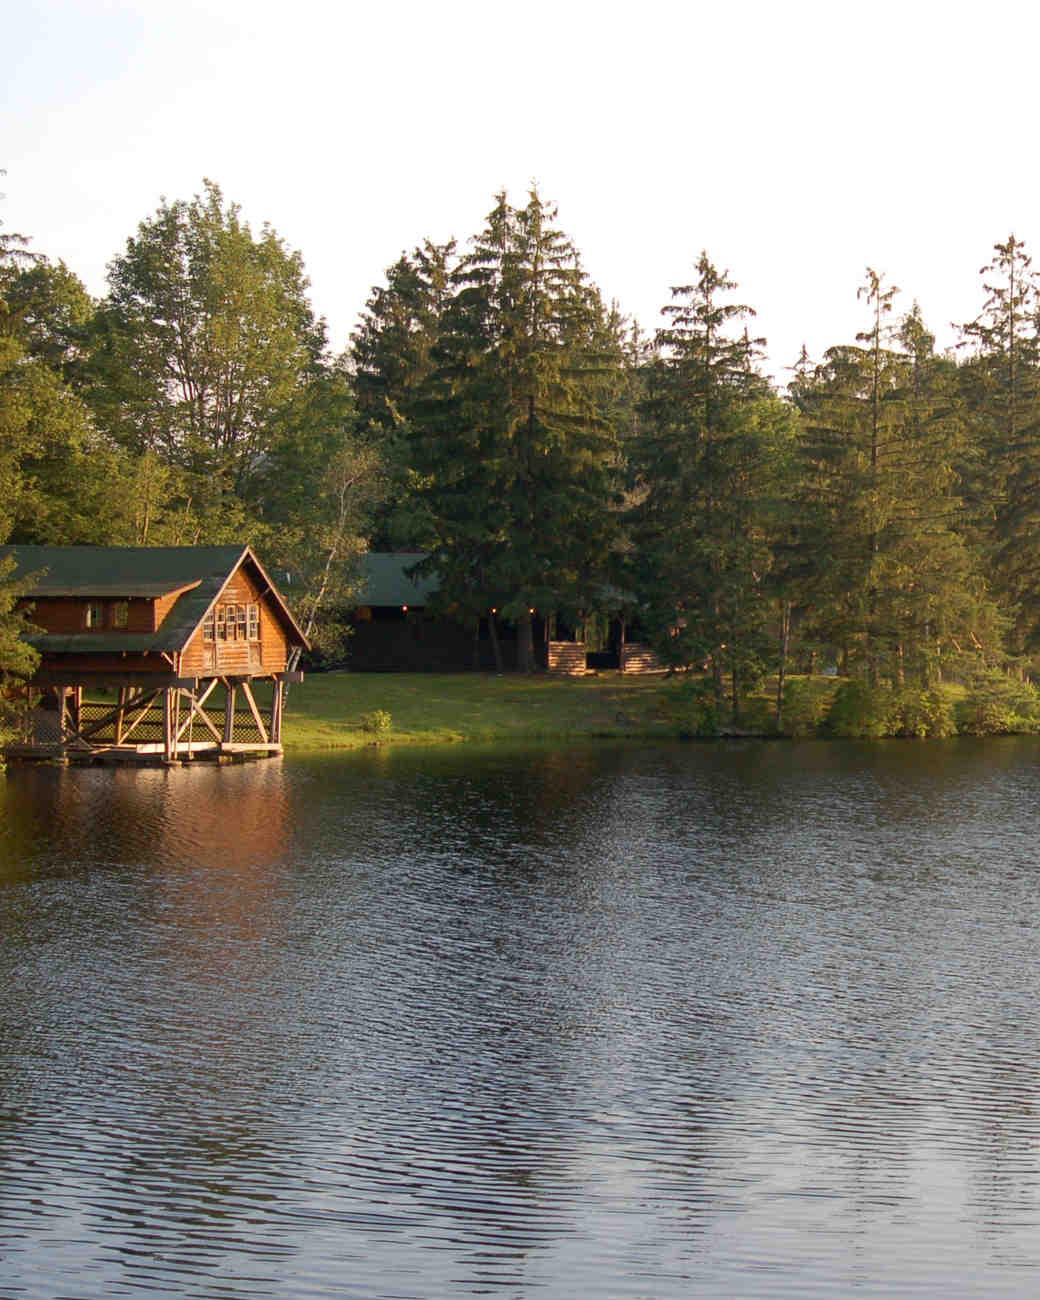 Plan a Wedding at Cedar Lakes Estate, an Upscale Former Summer Camp